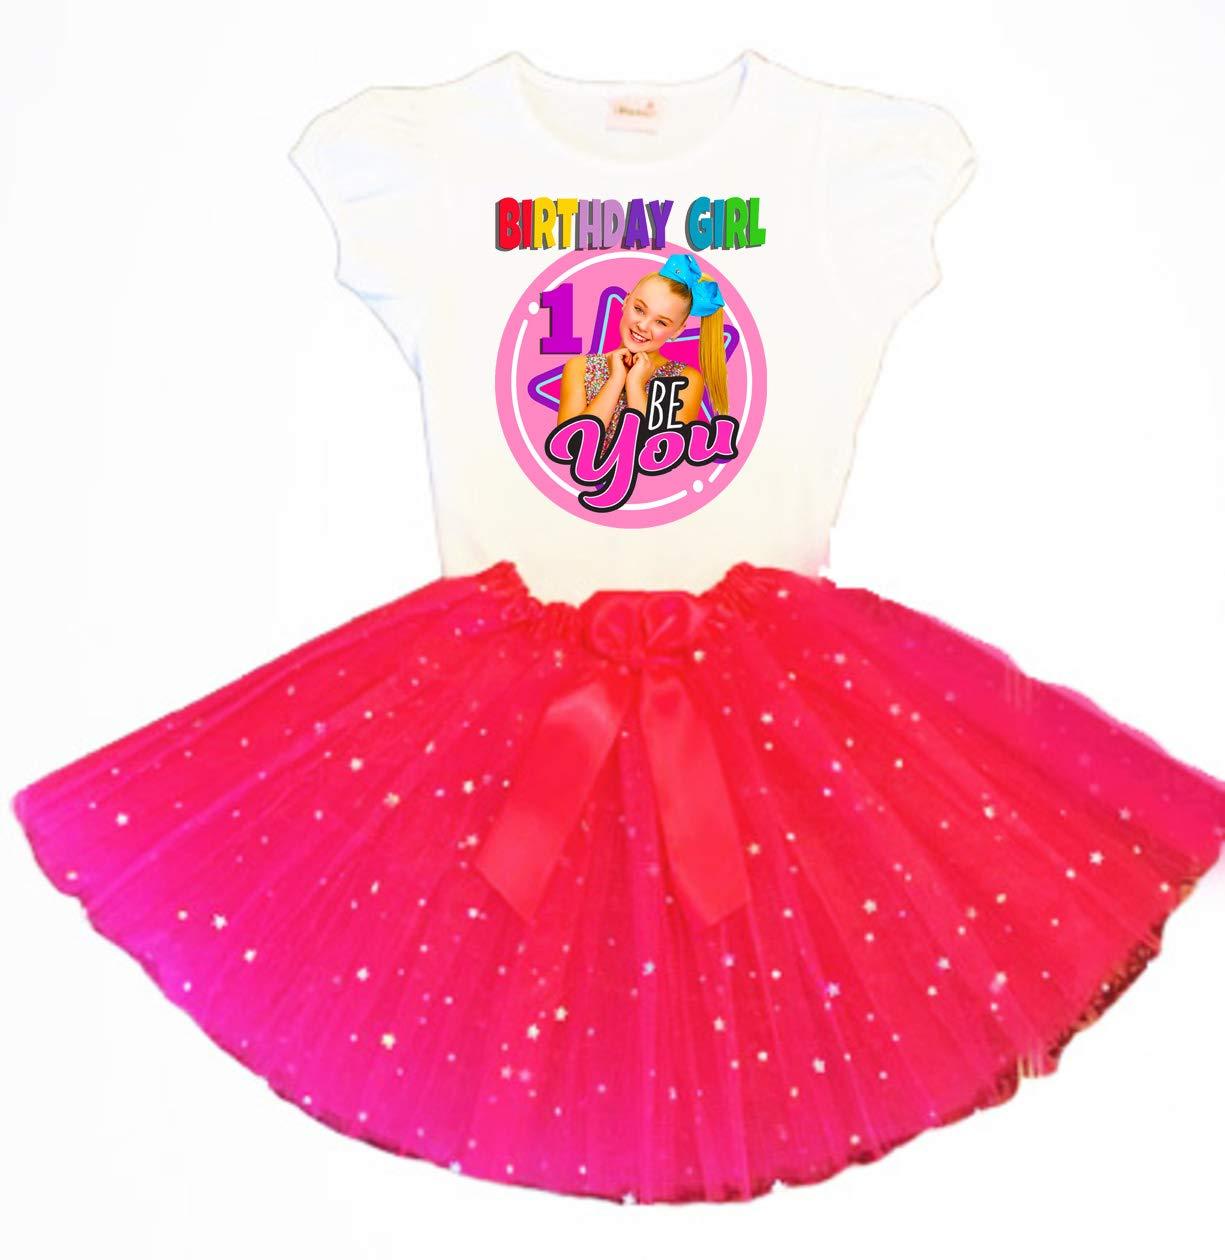 JoJo Birthday Tutu Ranking Luxury goods TOP2 1st Party Outfit Dress Fuchsia